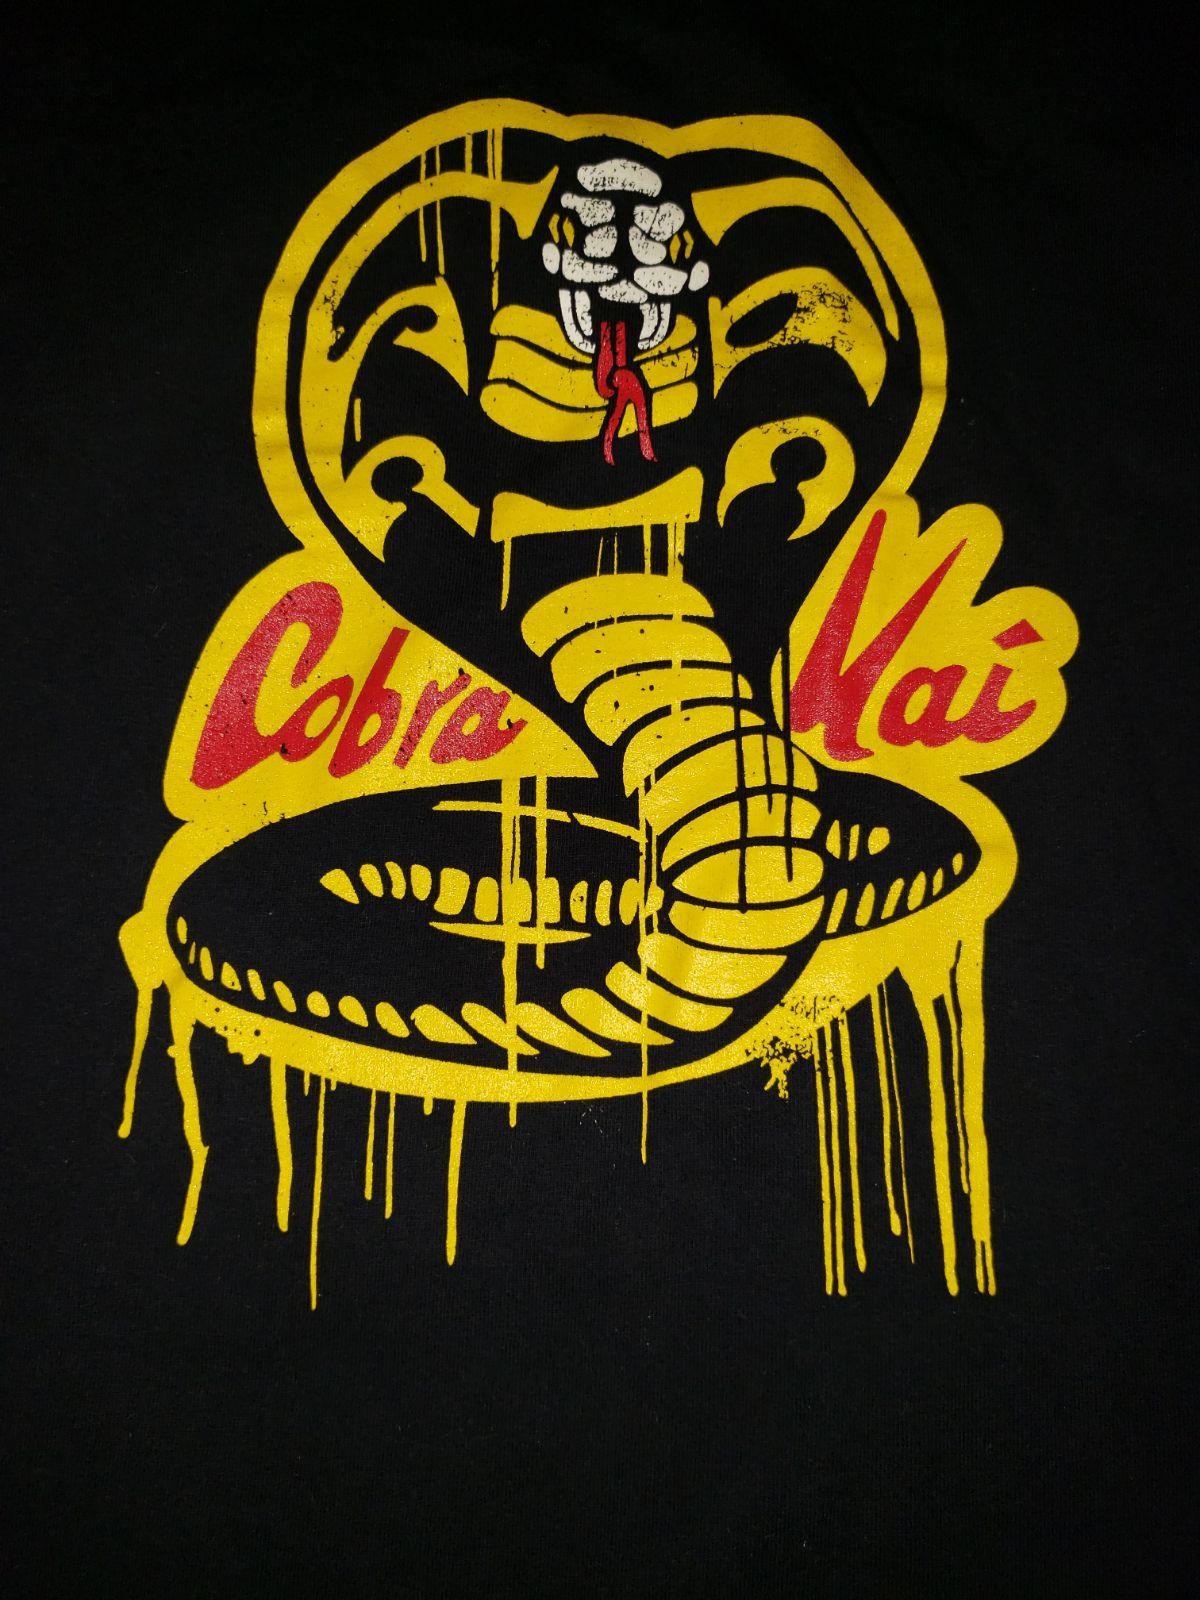 Fondasooo Cobra kai wallpaper Cobra kai t shirt Cobra kai dojo 1200x1600